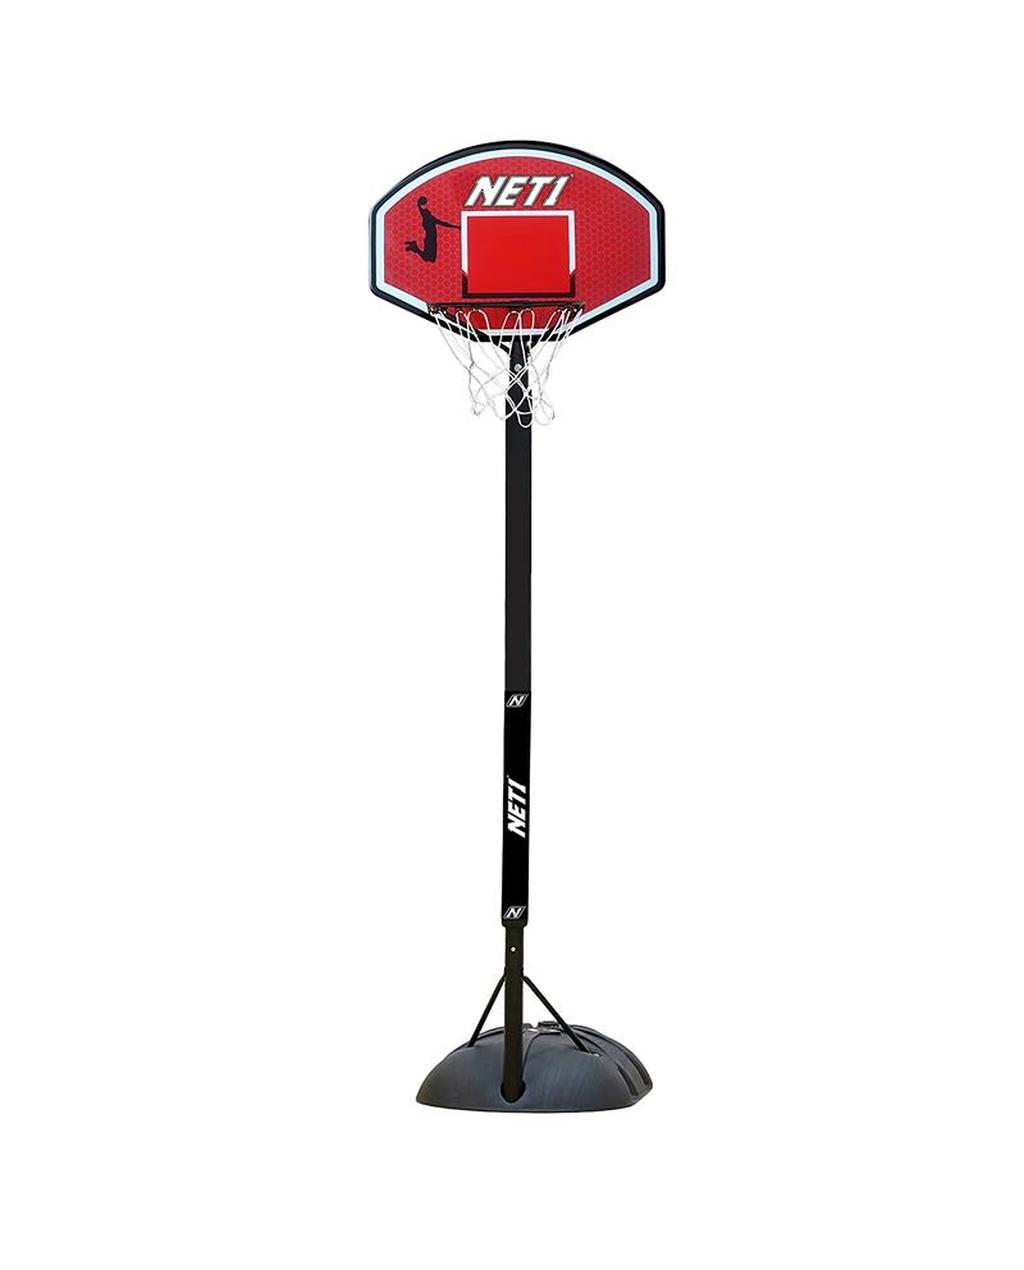 Net1 Xplode Basketball System